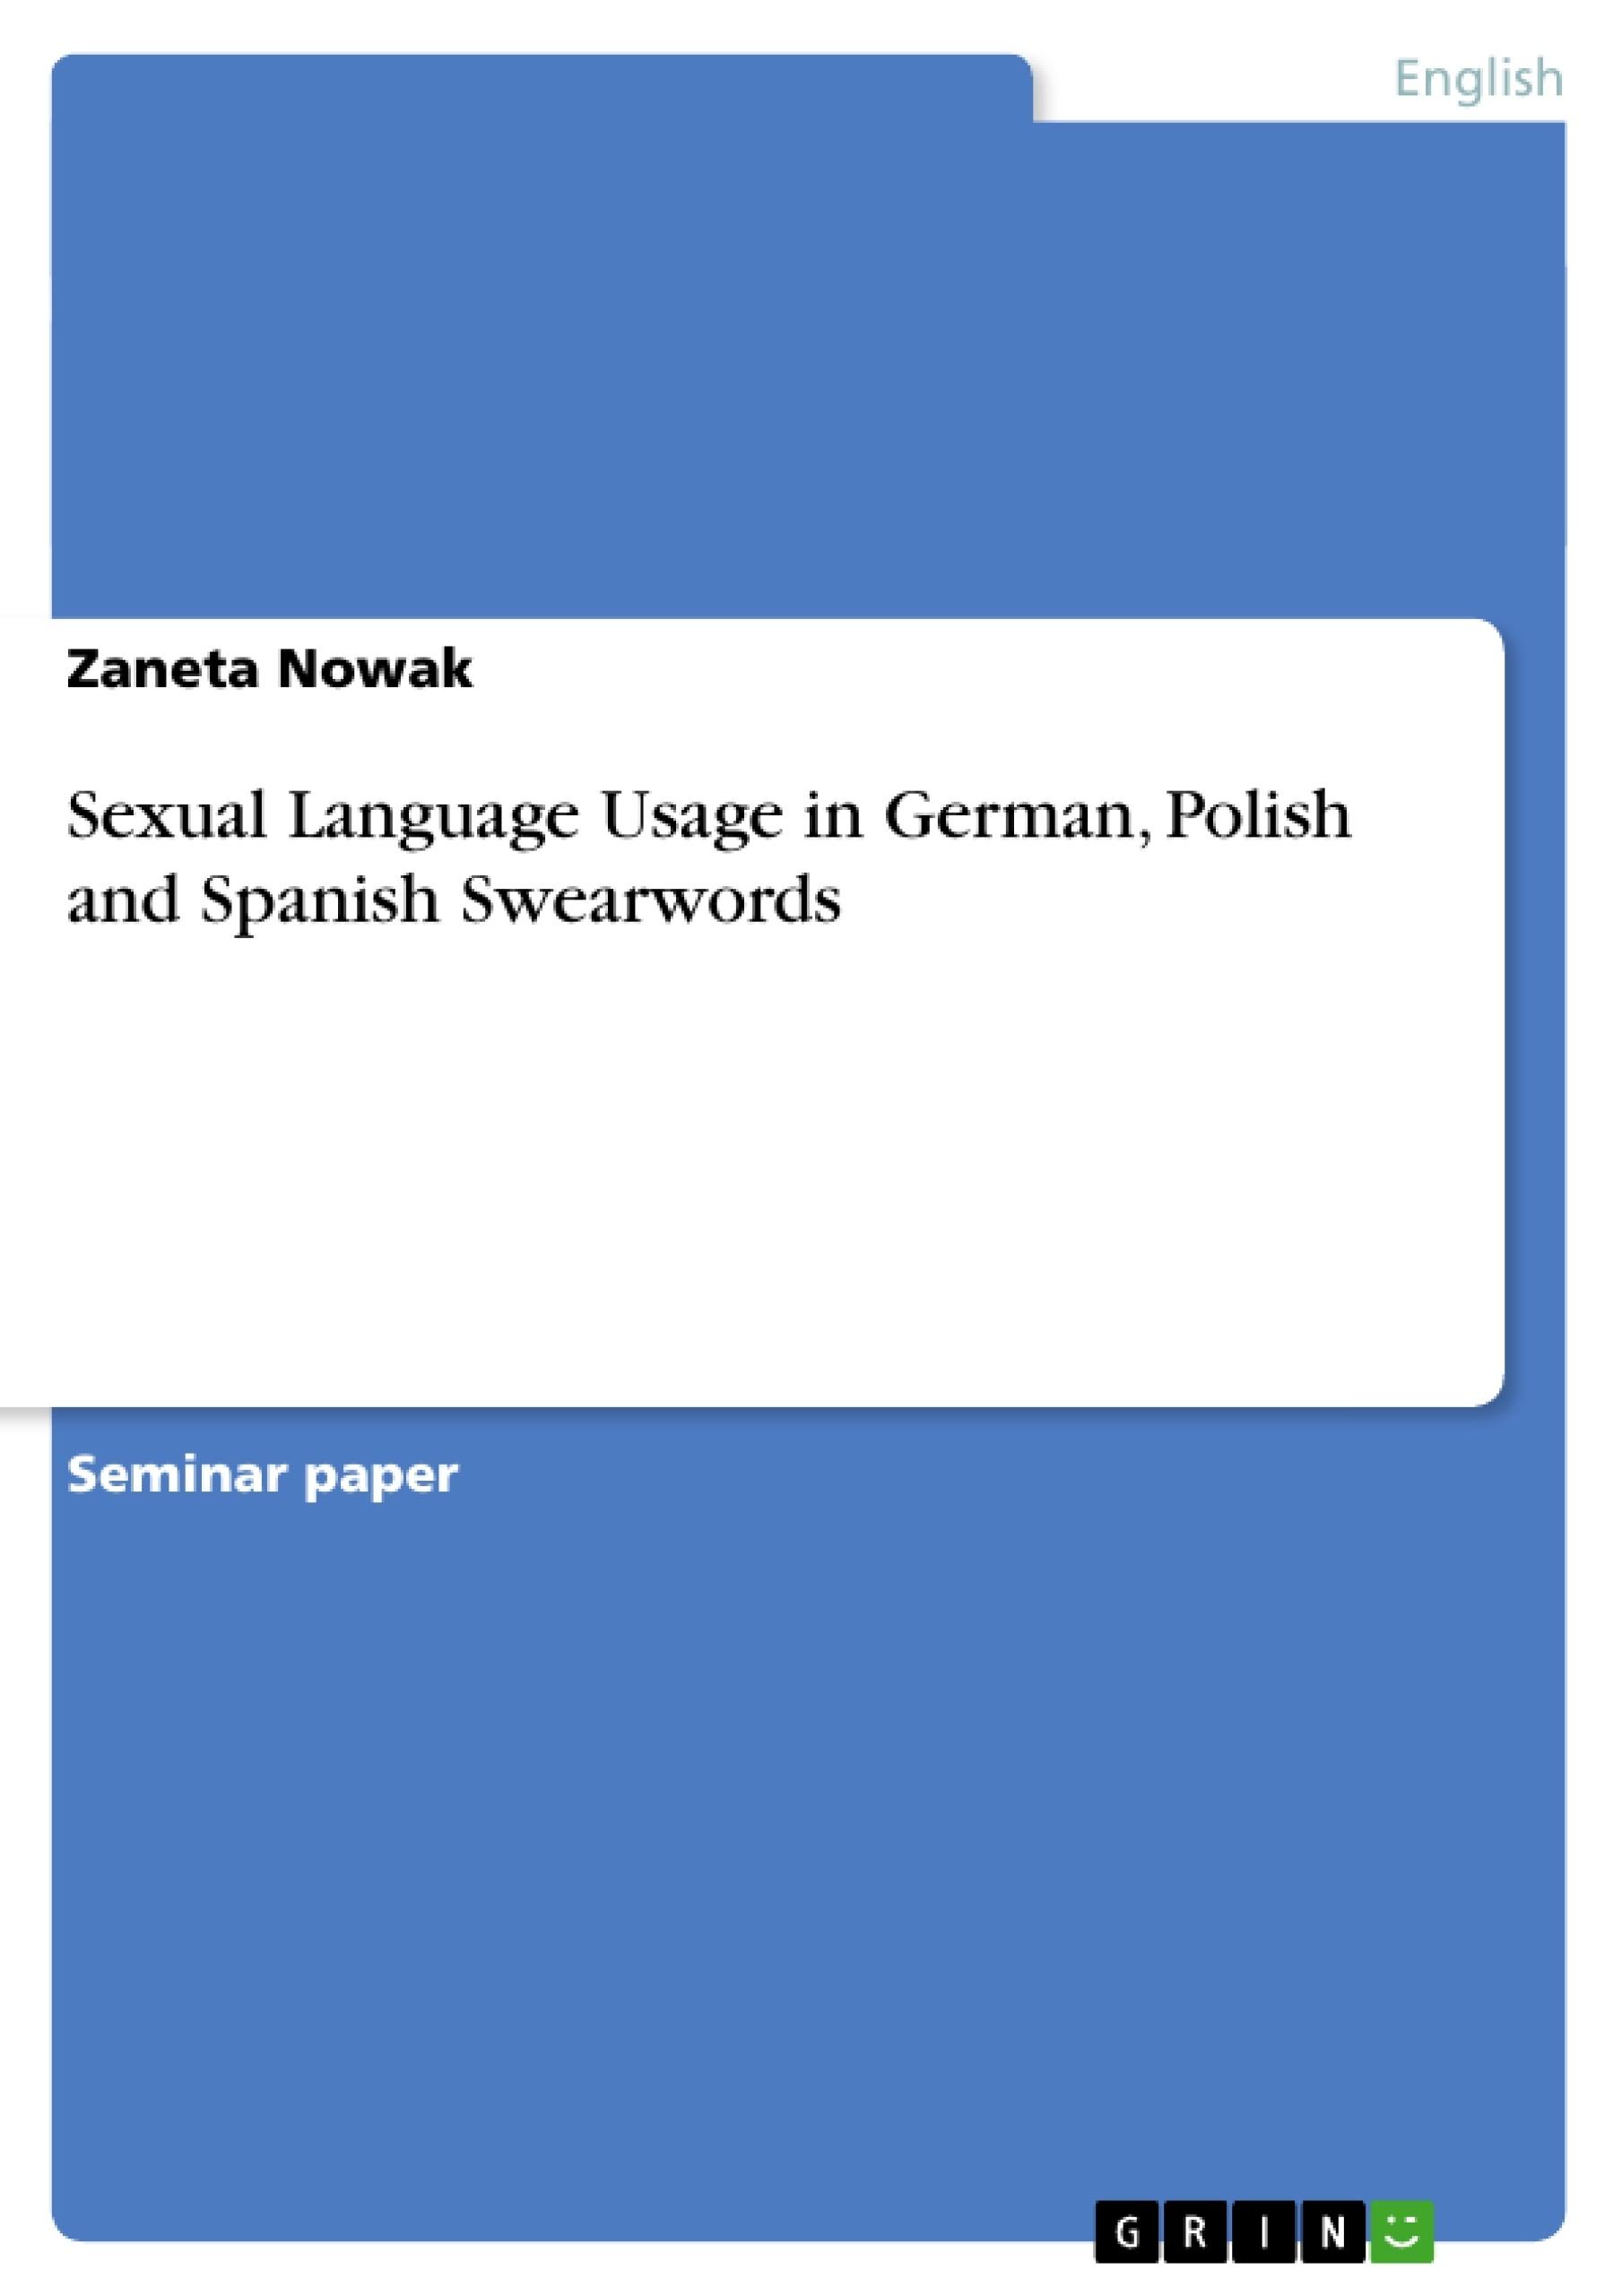 Title: Sexual Language Usage in German, Polish and Spanish Swearwords